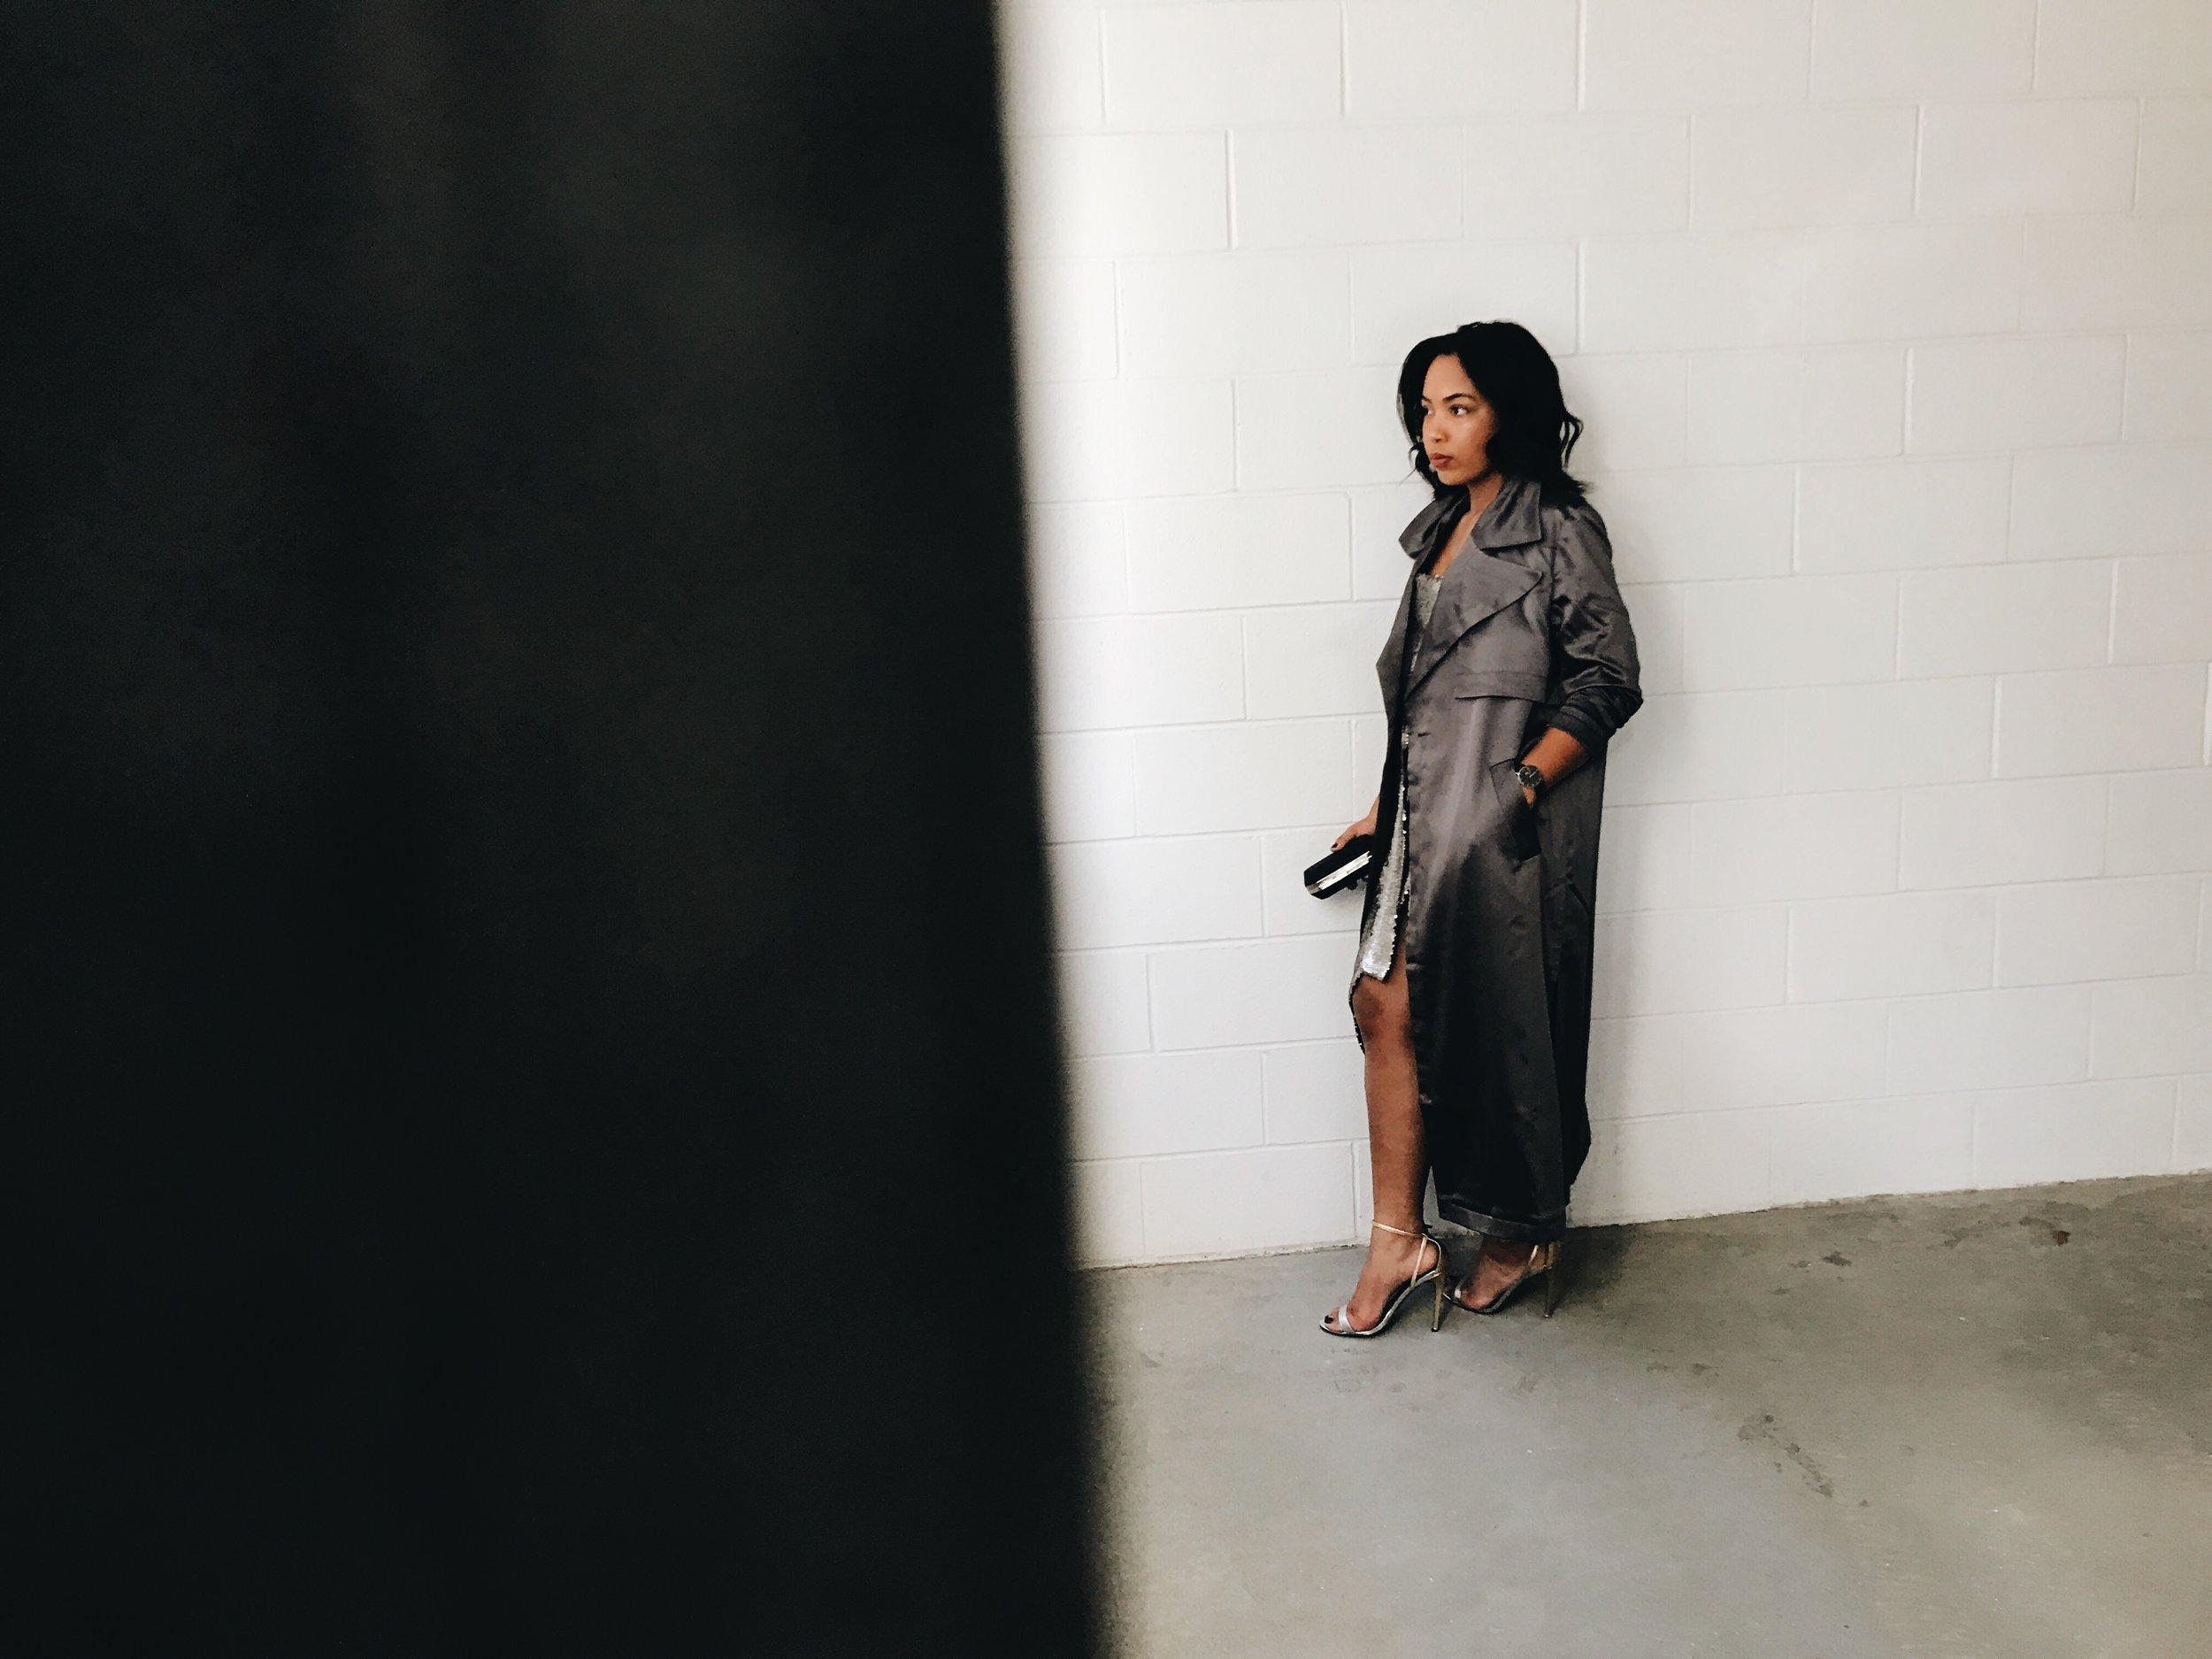 10-Lavish-Alice-Sequin-Dress-ASOS-Satin-Trench-Coat-Metallic-Heels-NYE-outfit.jpg